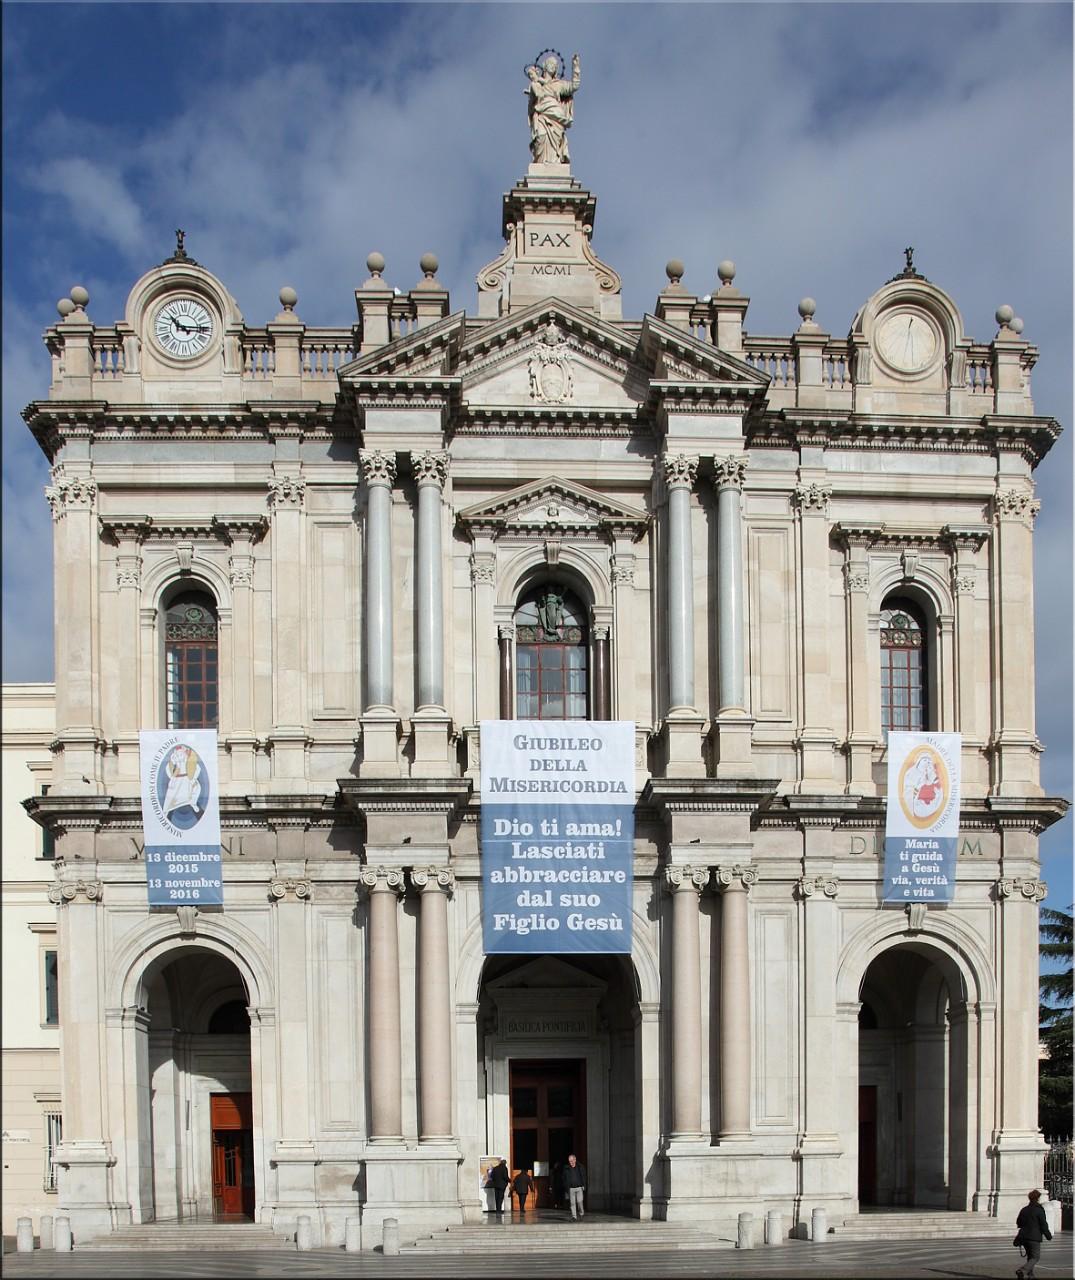 Santuario della Beata Vergine del Rosario di Pompei